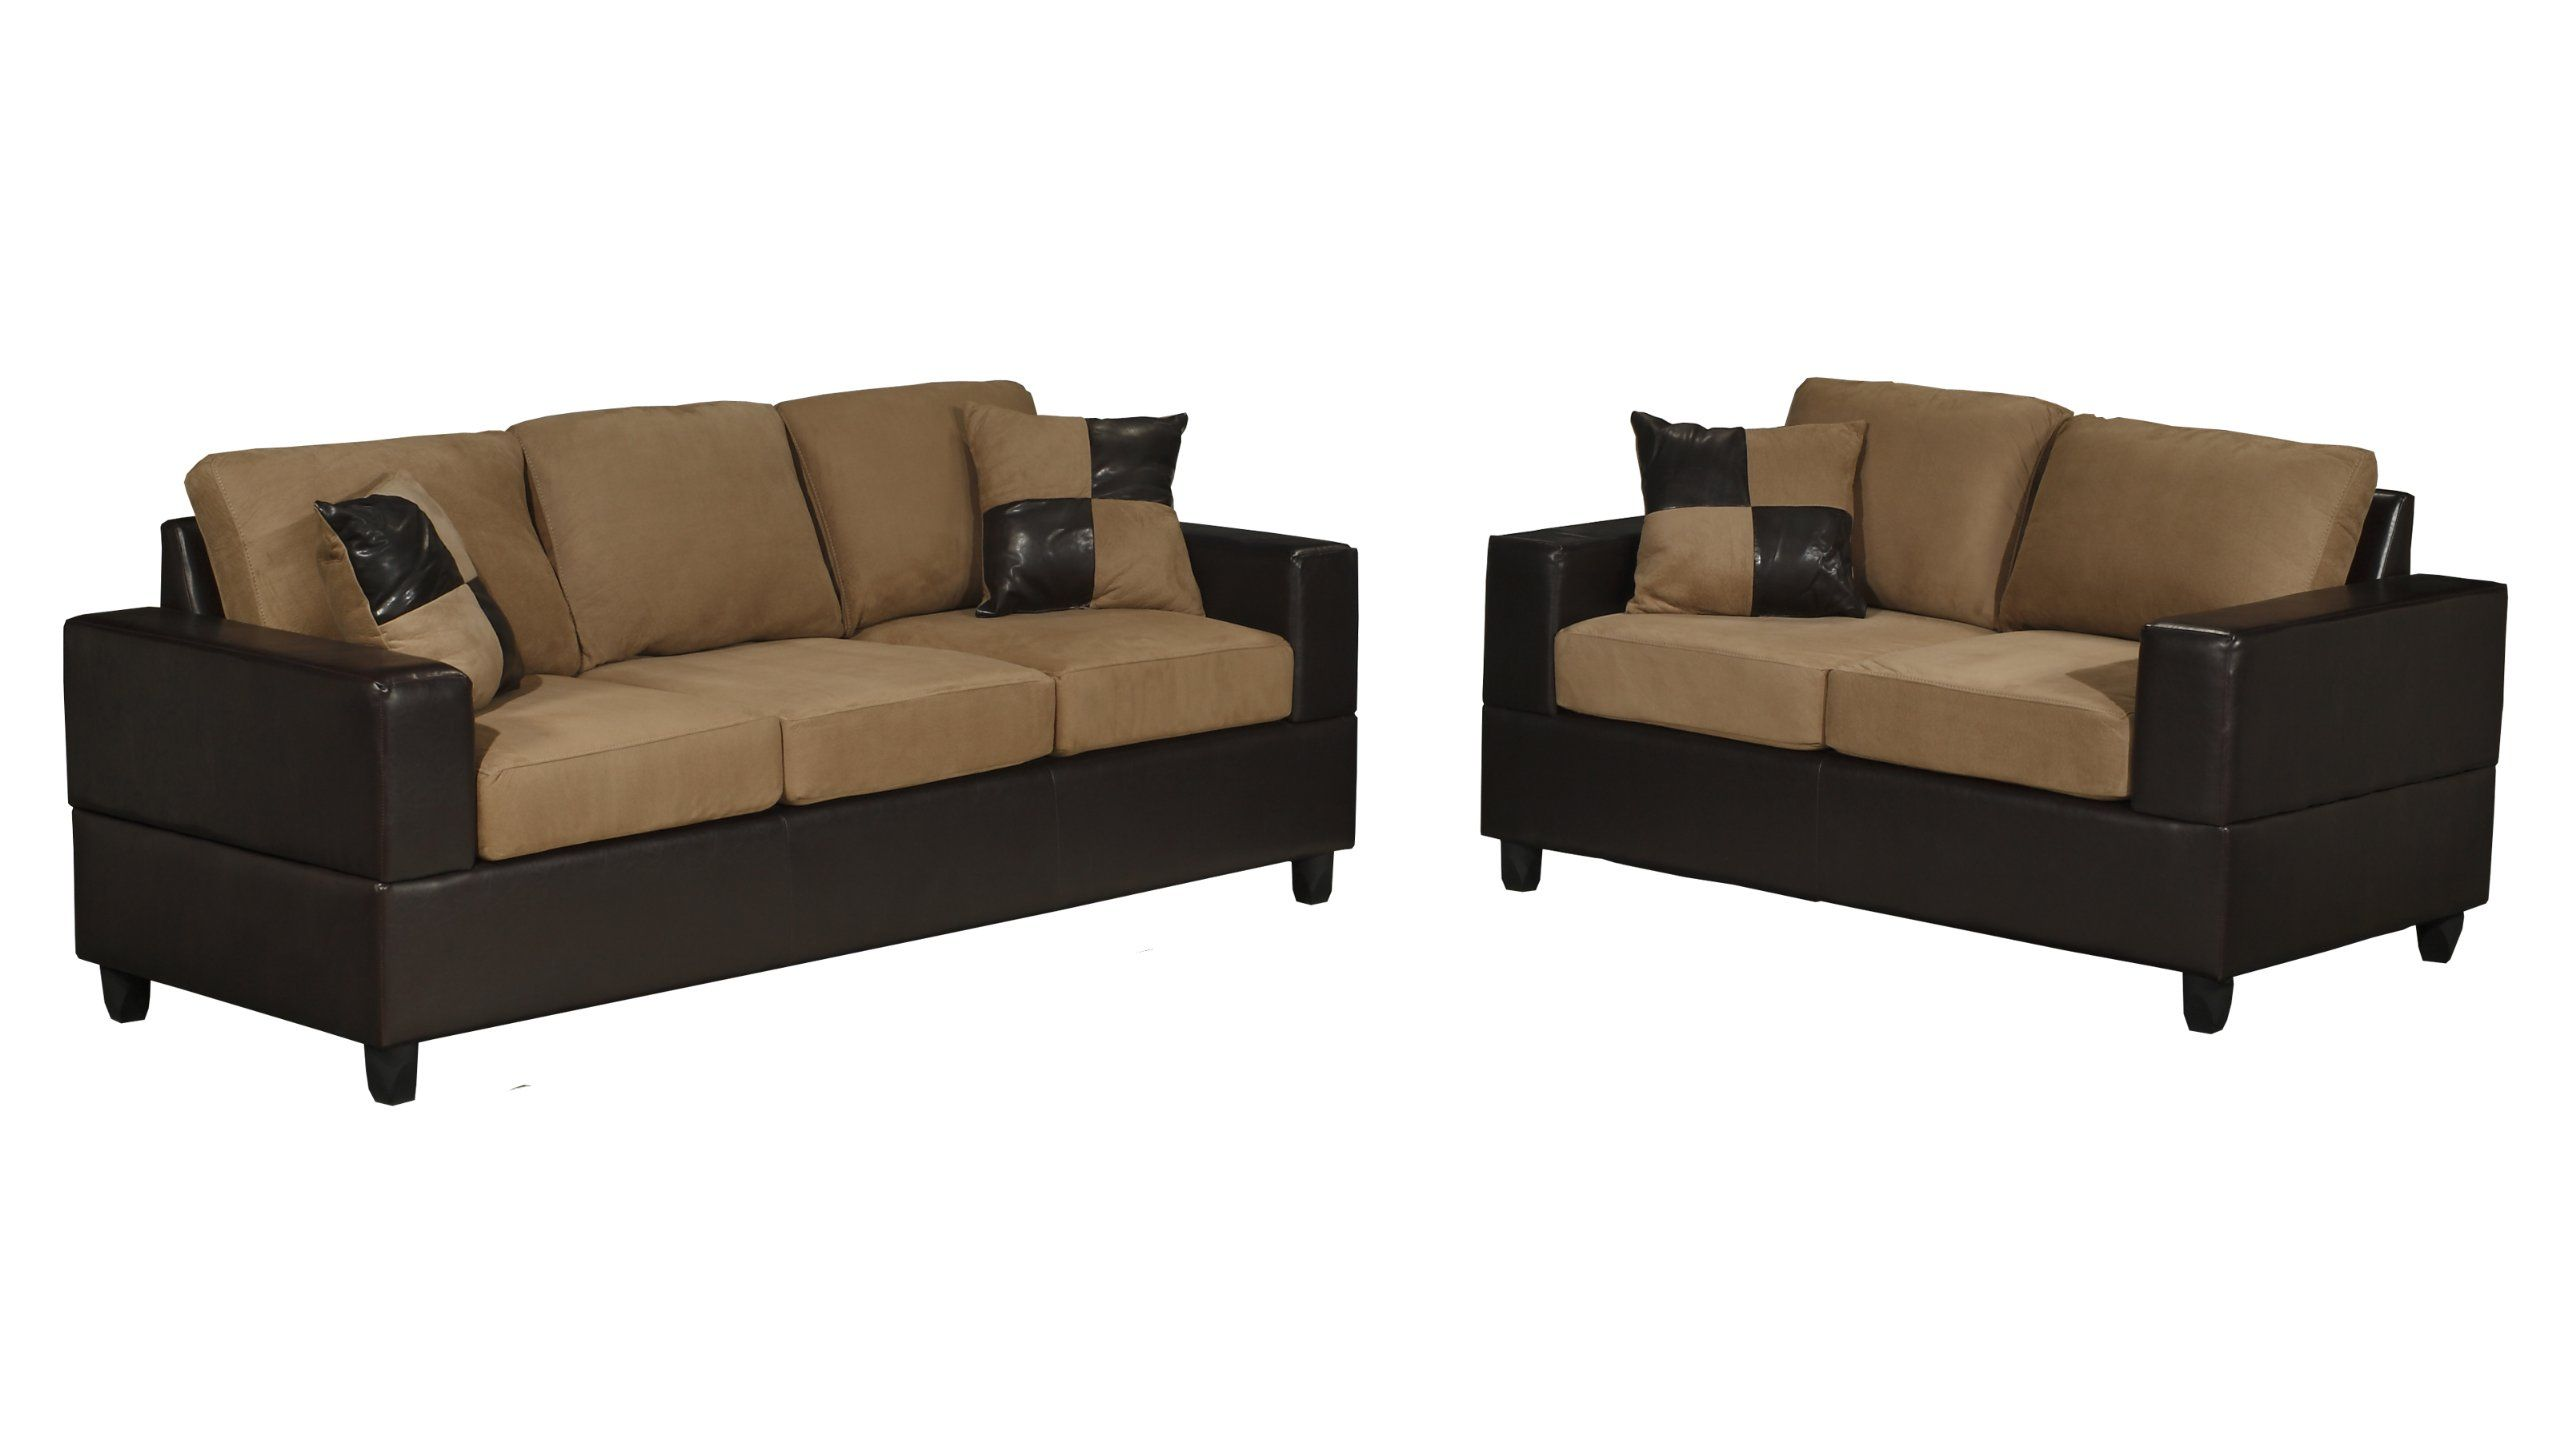 $524 Bobkona Seattle Microfiber Sofa and Loveseat 2-Piece Set in ...